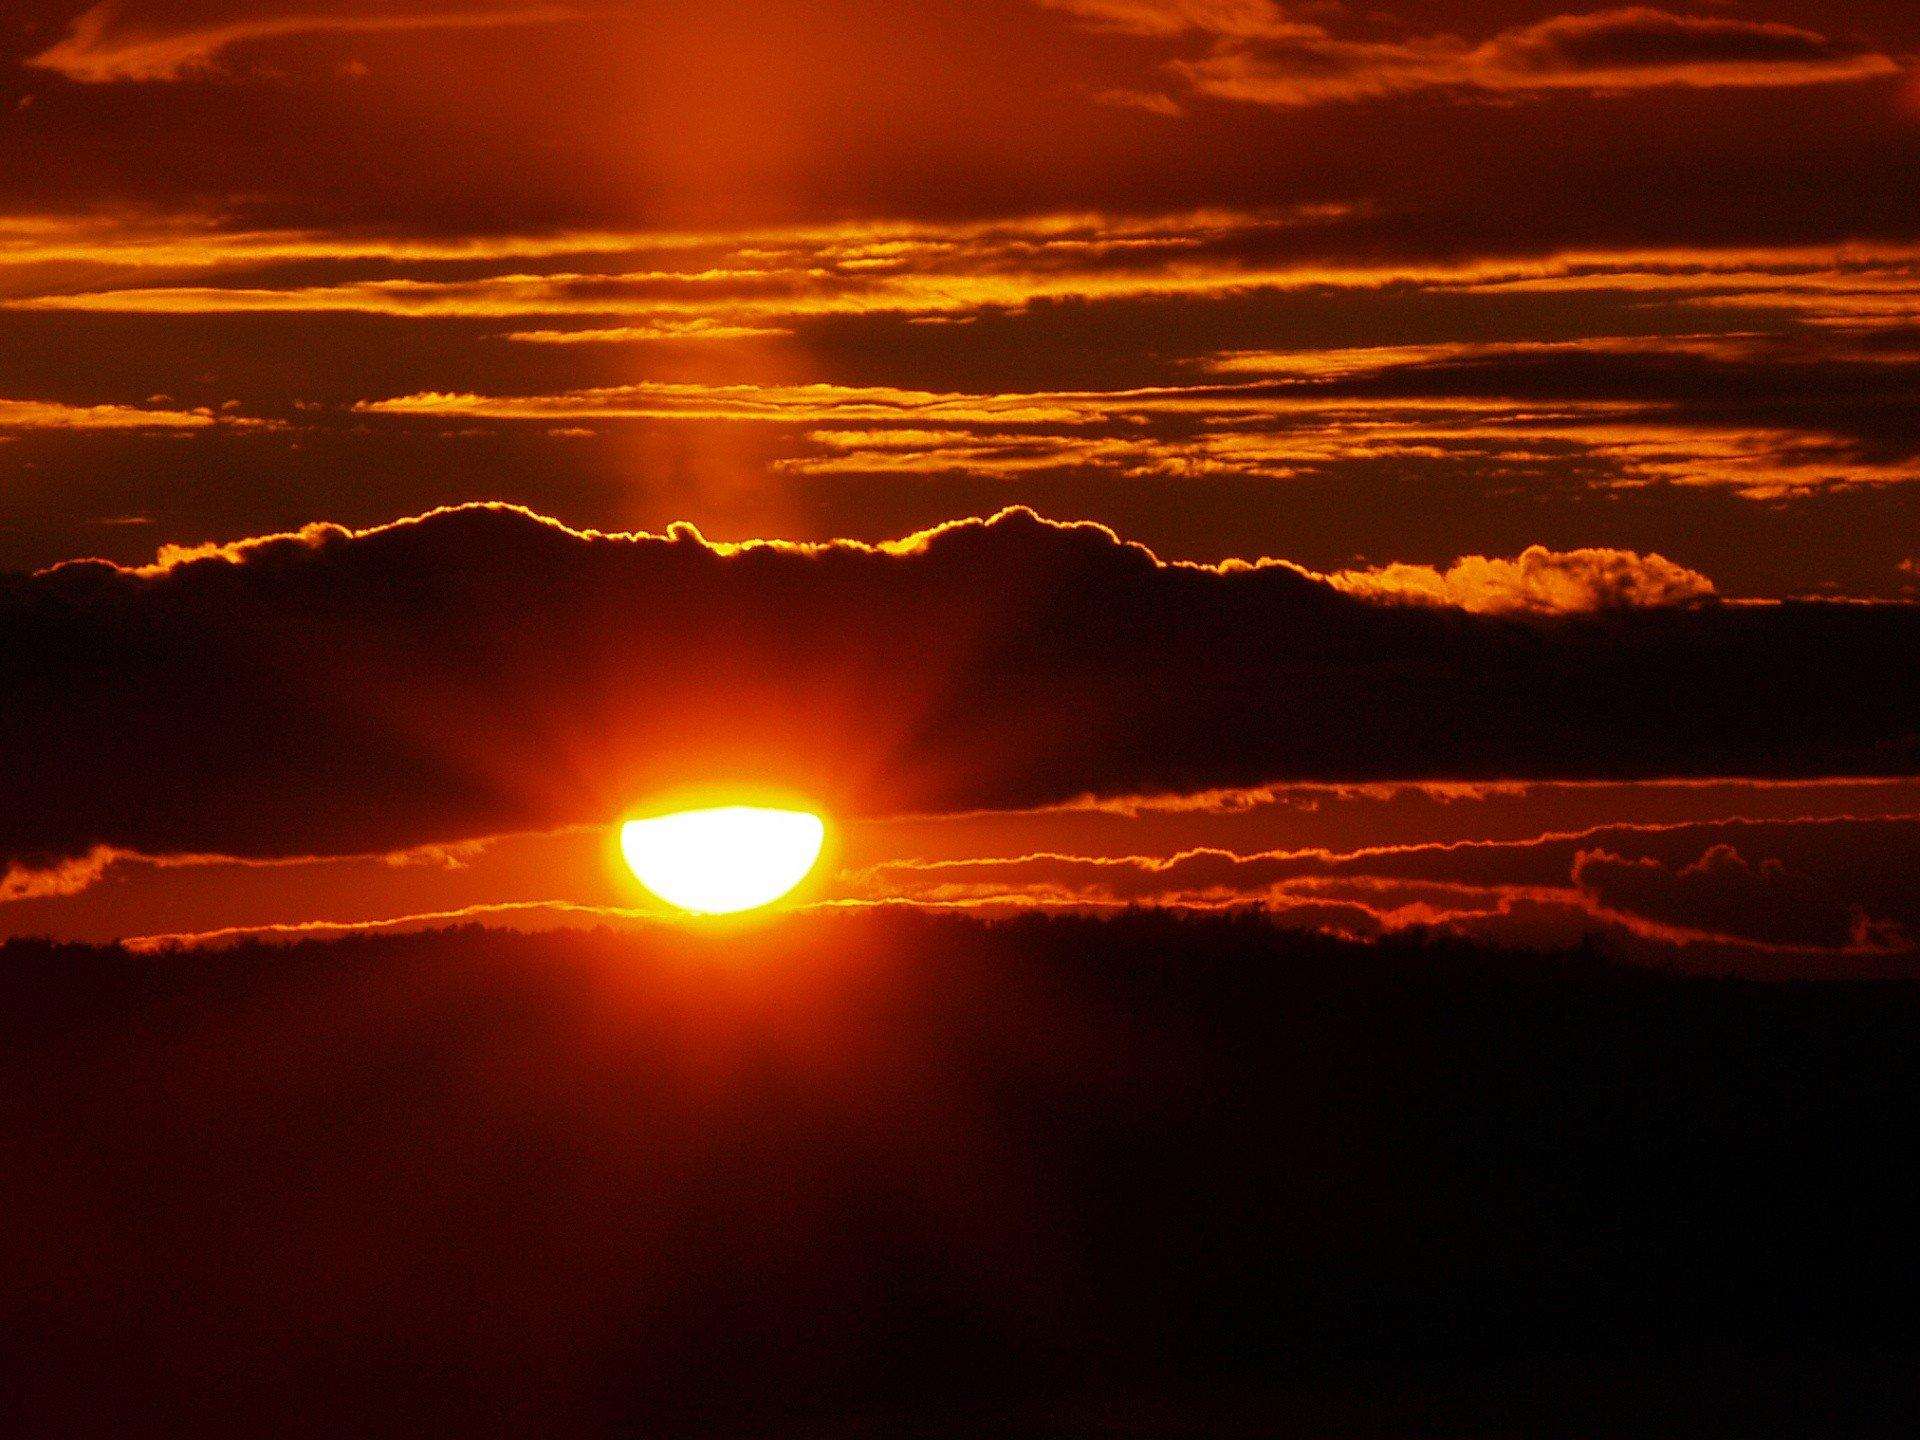 закат солнце облака  № 3852017  скачать